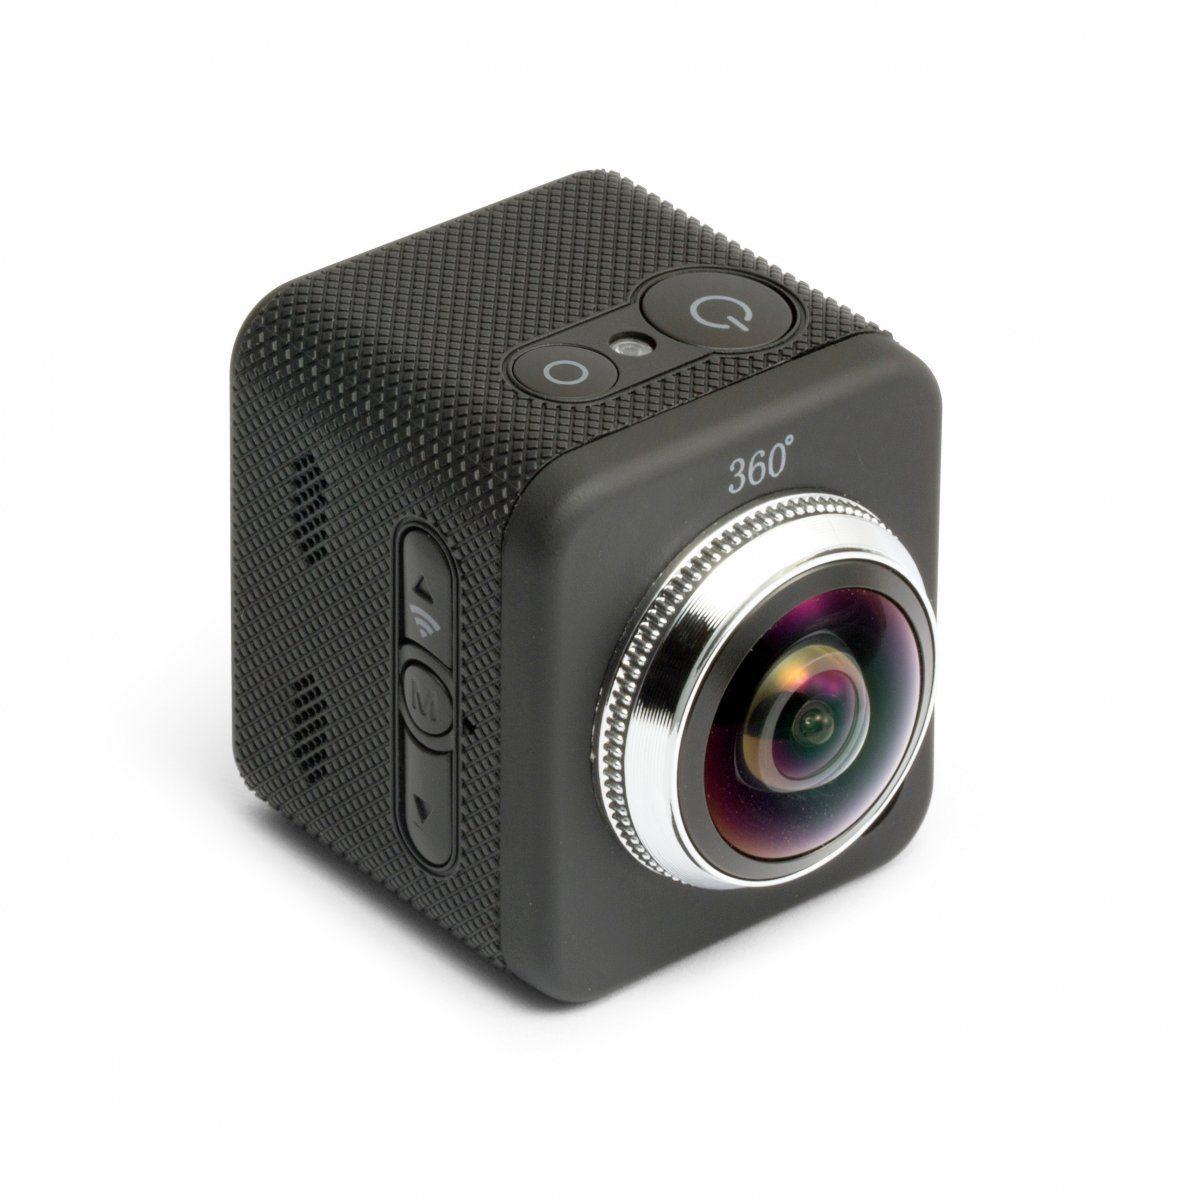 Technaxx Netzwerkkamera Hardware »Technaxx Action Cam FullHD 360 TX-96«